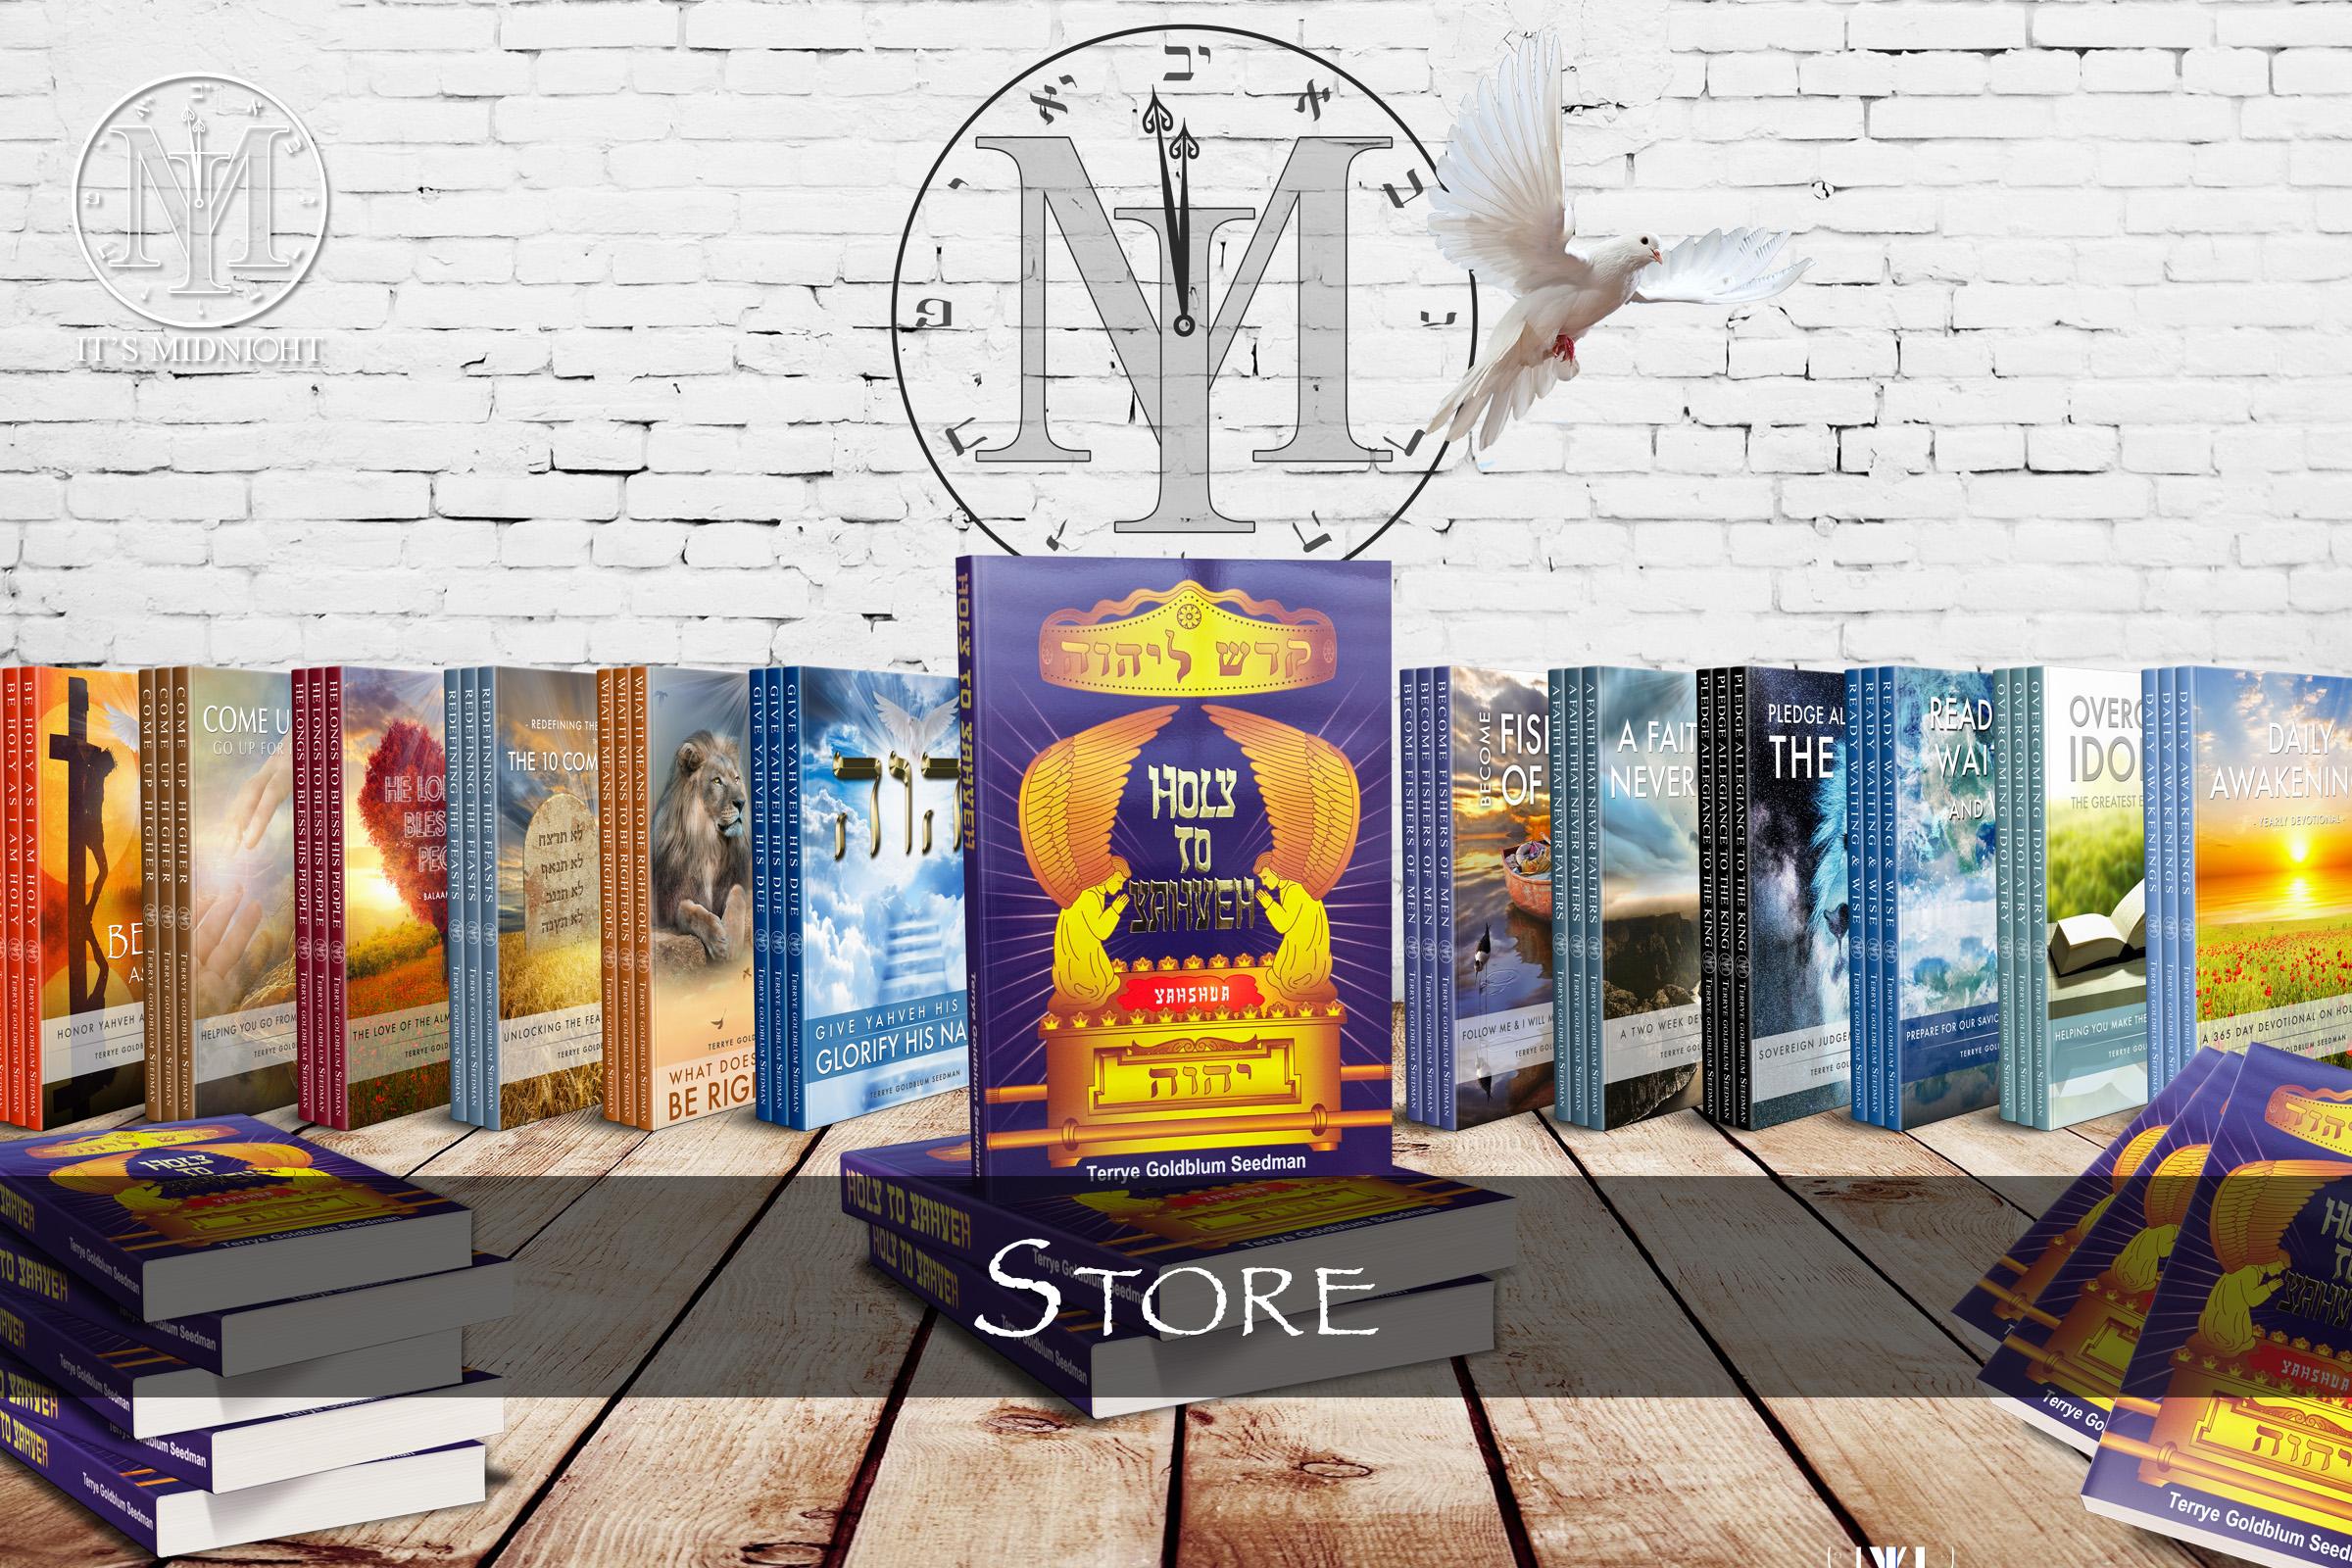 Store Thumbnail - All Books.jpg